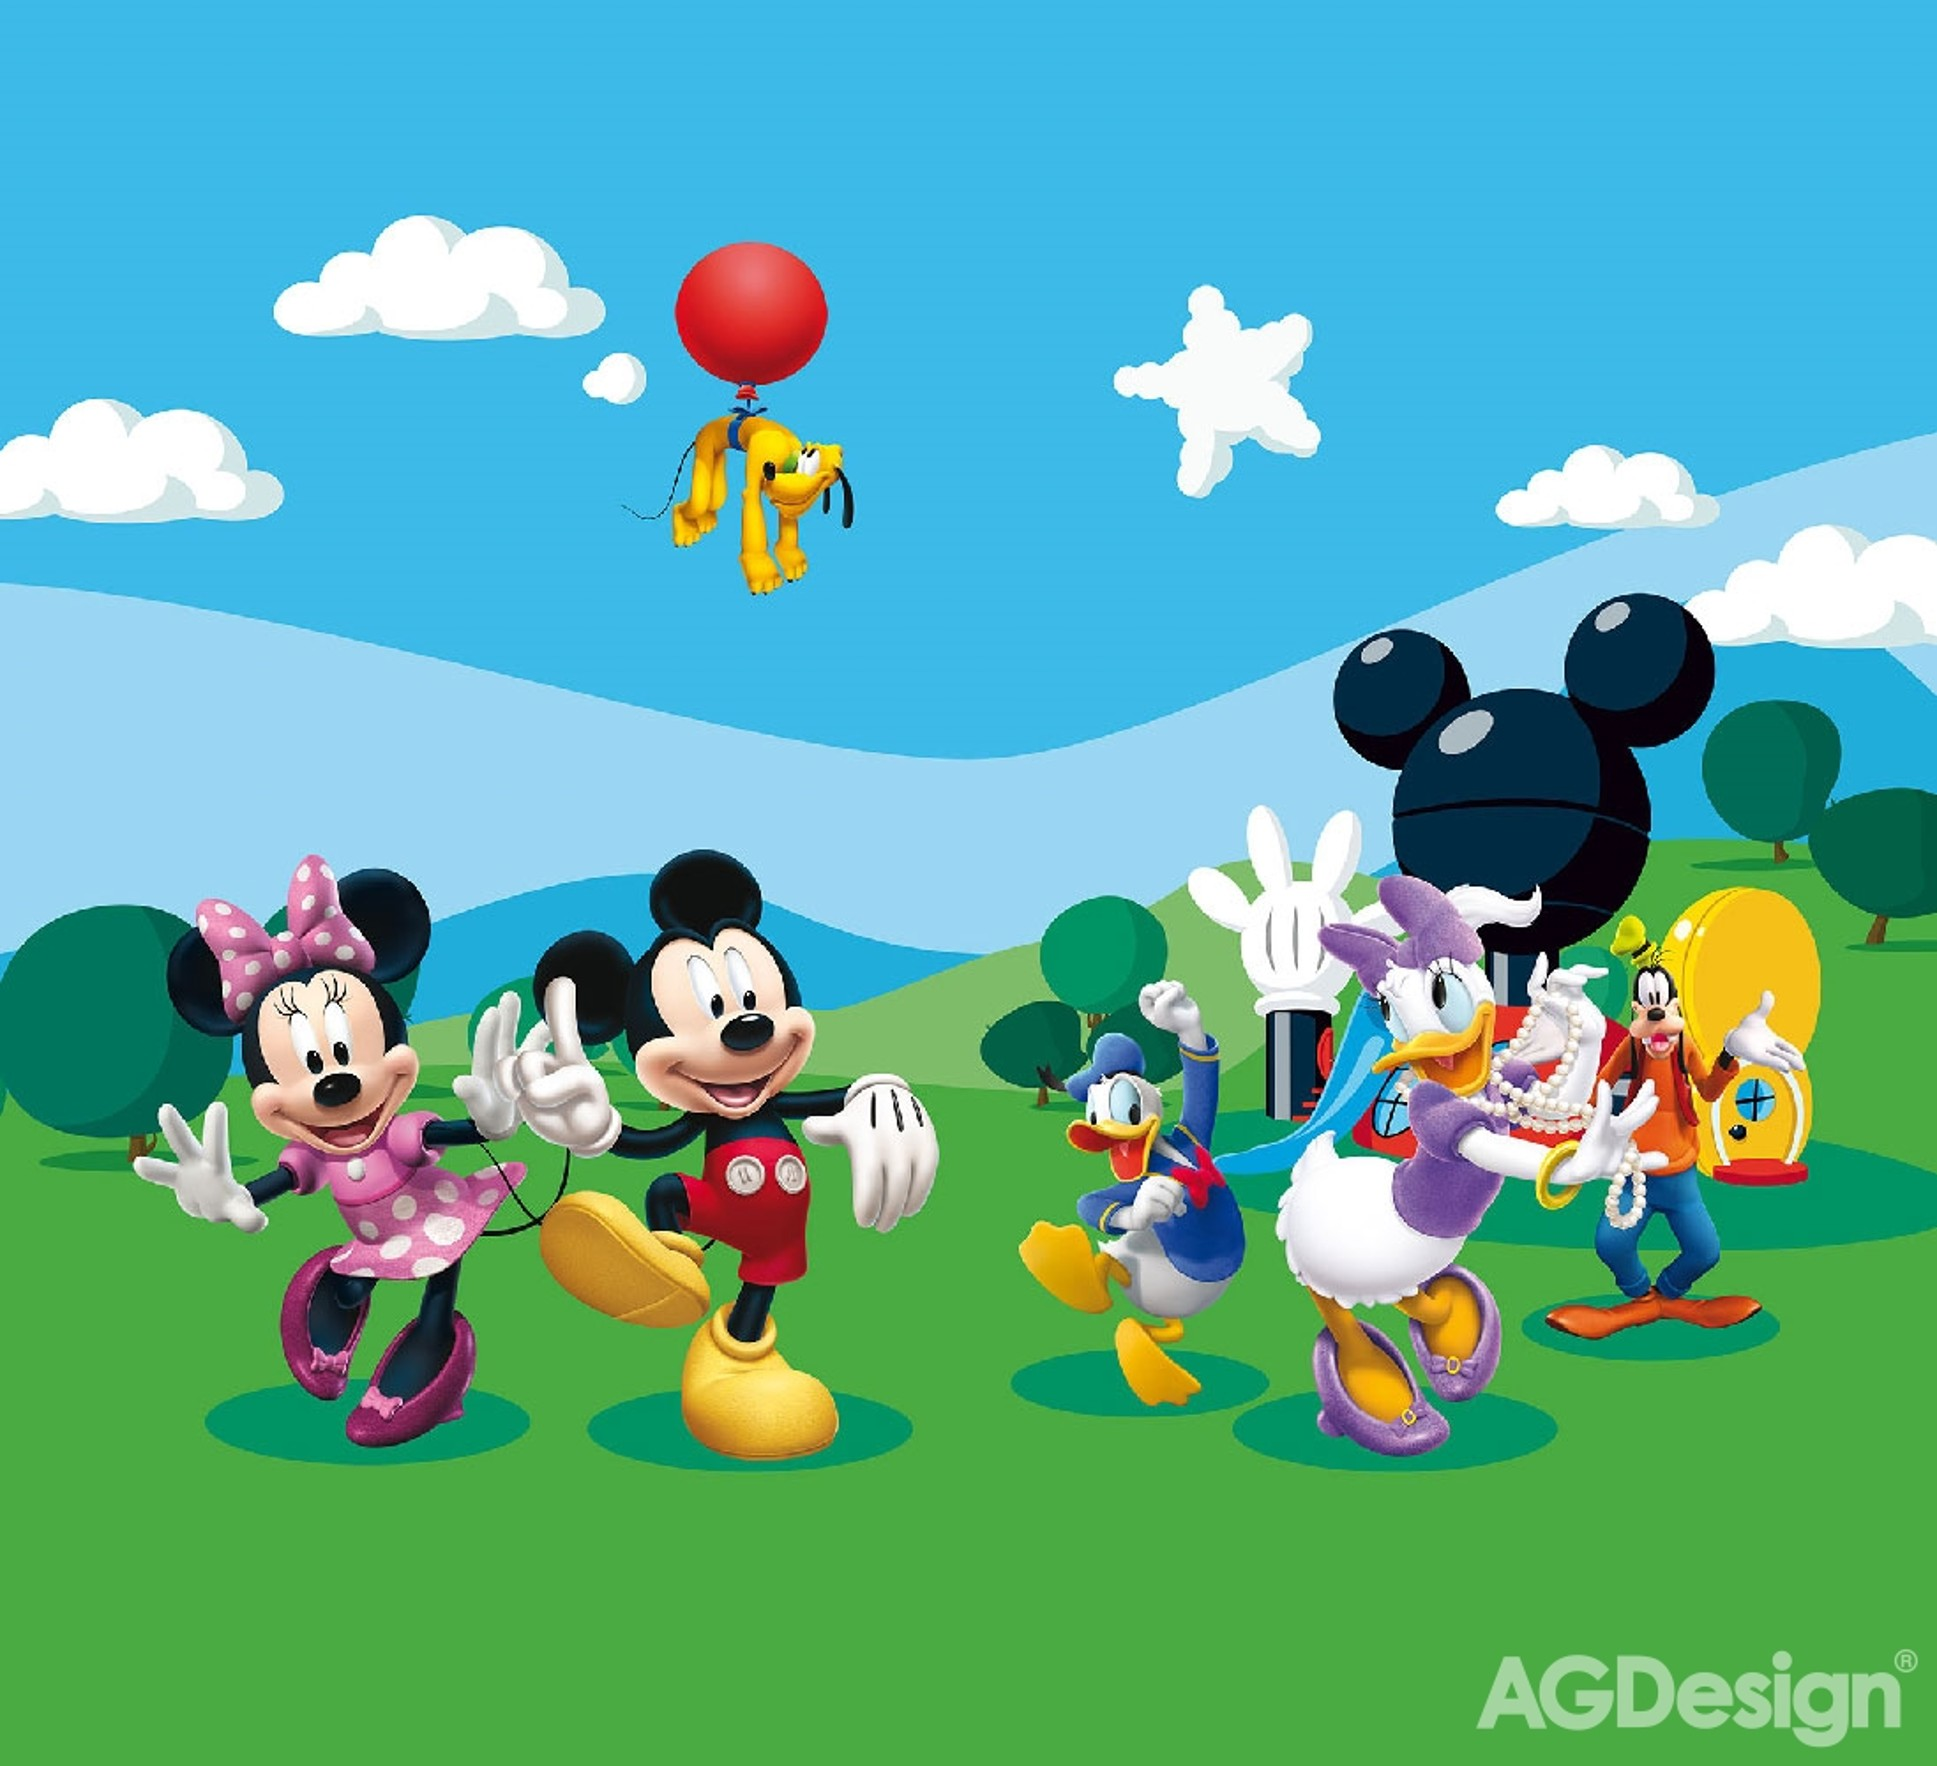 Fotozávěsy AG Design Mickey FCP XXL 6008 (Závěs PES 280g | 280 x 245 cm)